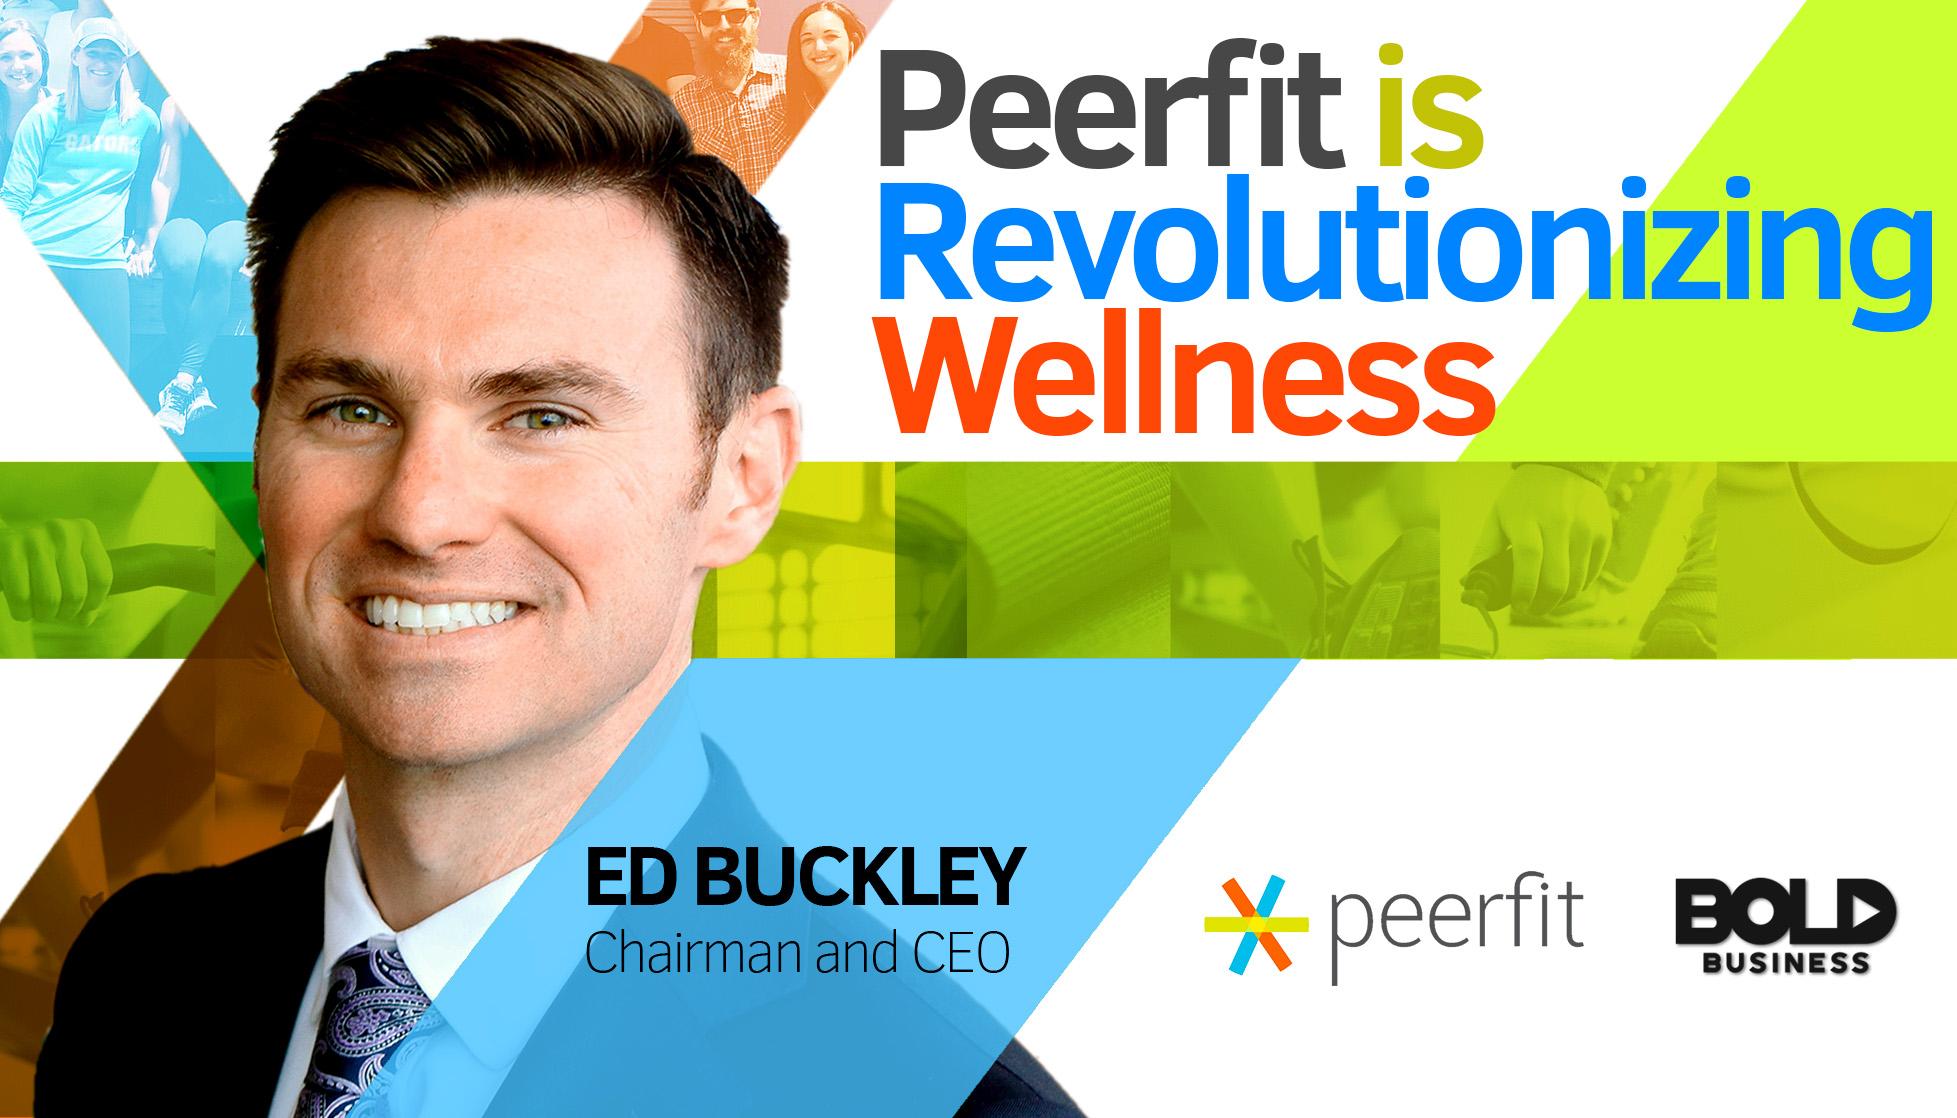 Revolutionizing Wellness- Peerfit